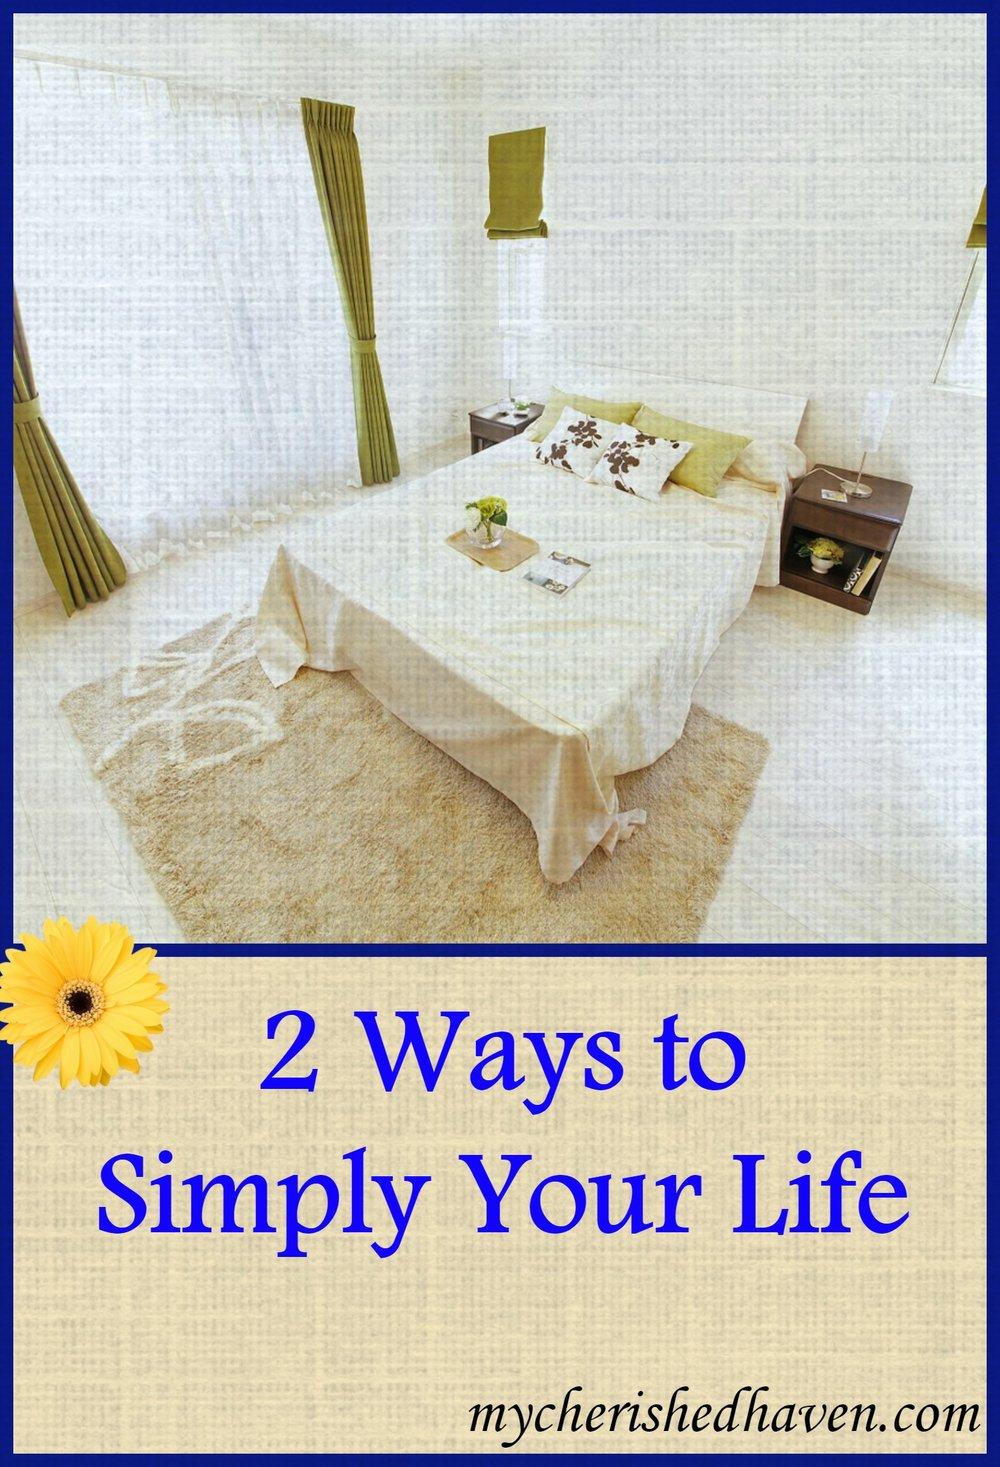 simplify your life.jpg